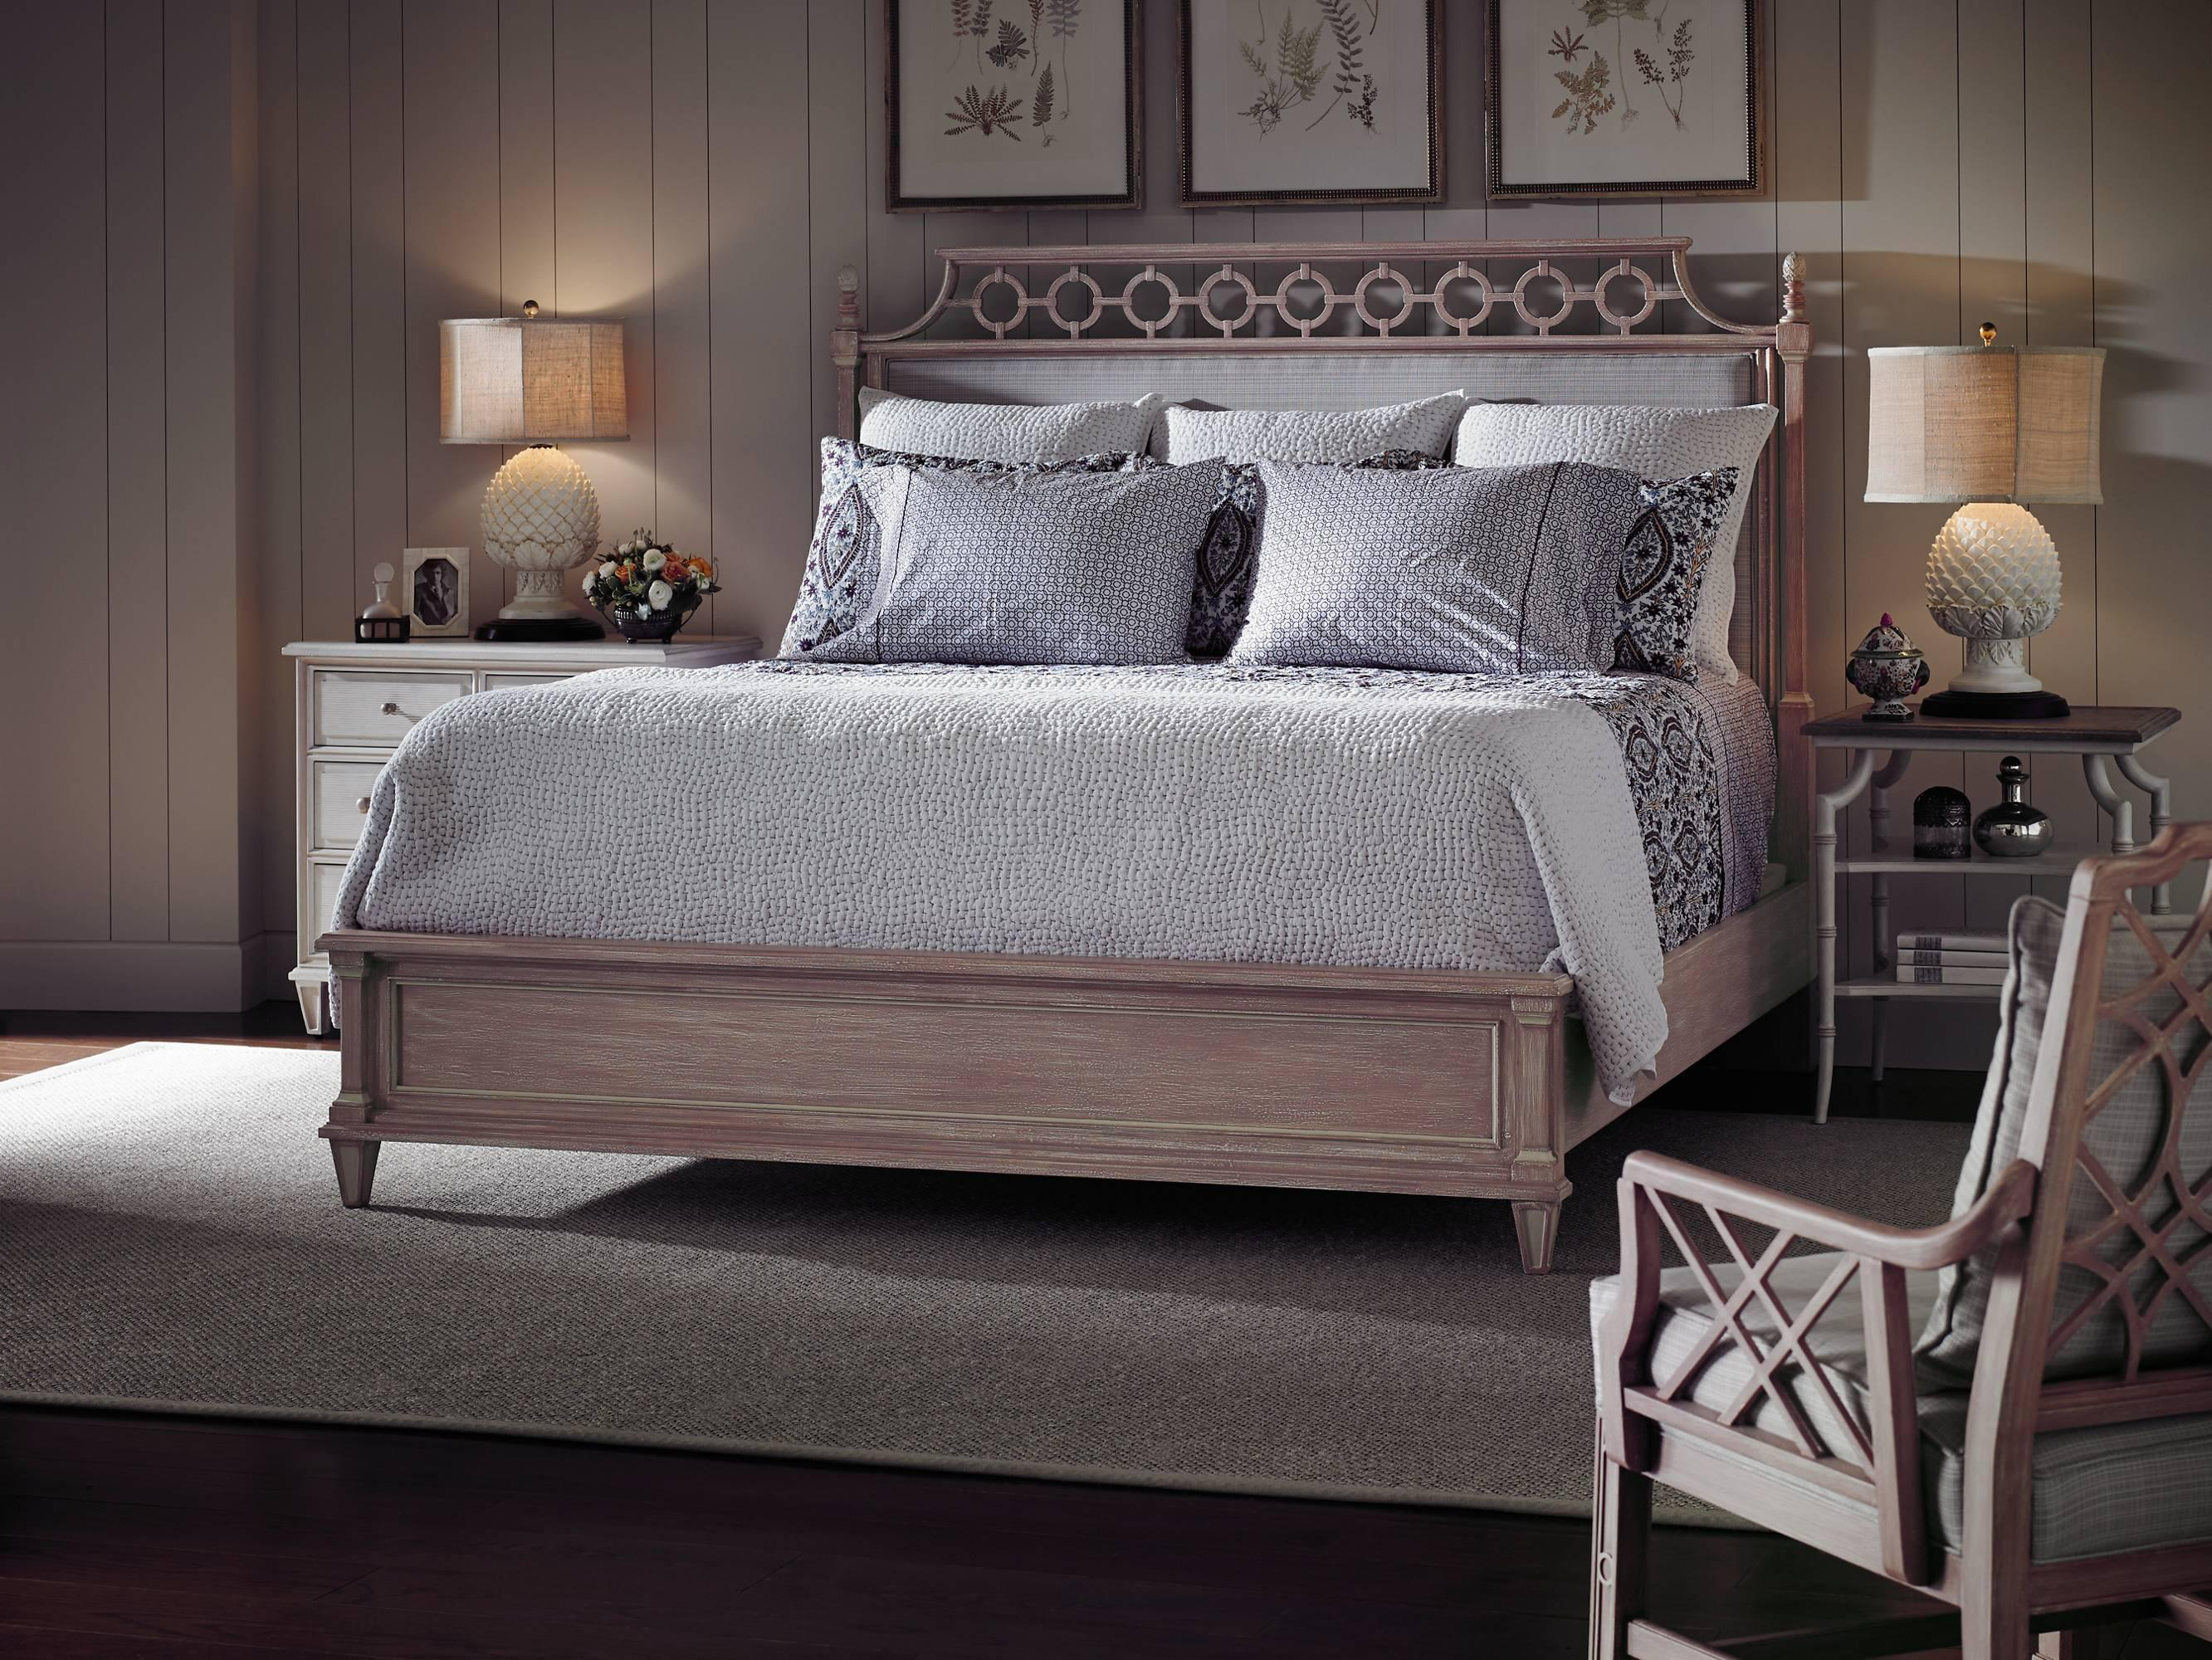 Stanley Furniture Preserve California King Bedroom Group - Item Number: 340-7 CK Bedroom Group 1